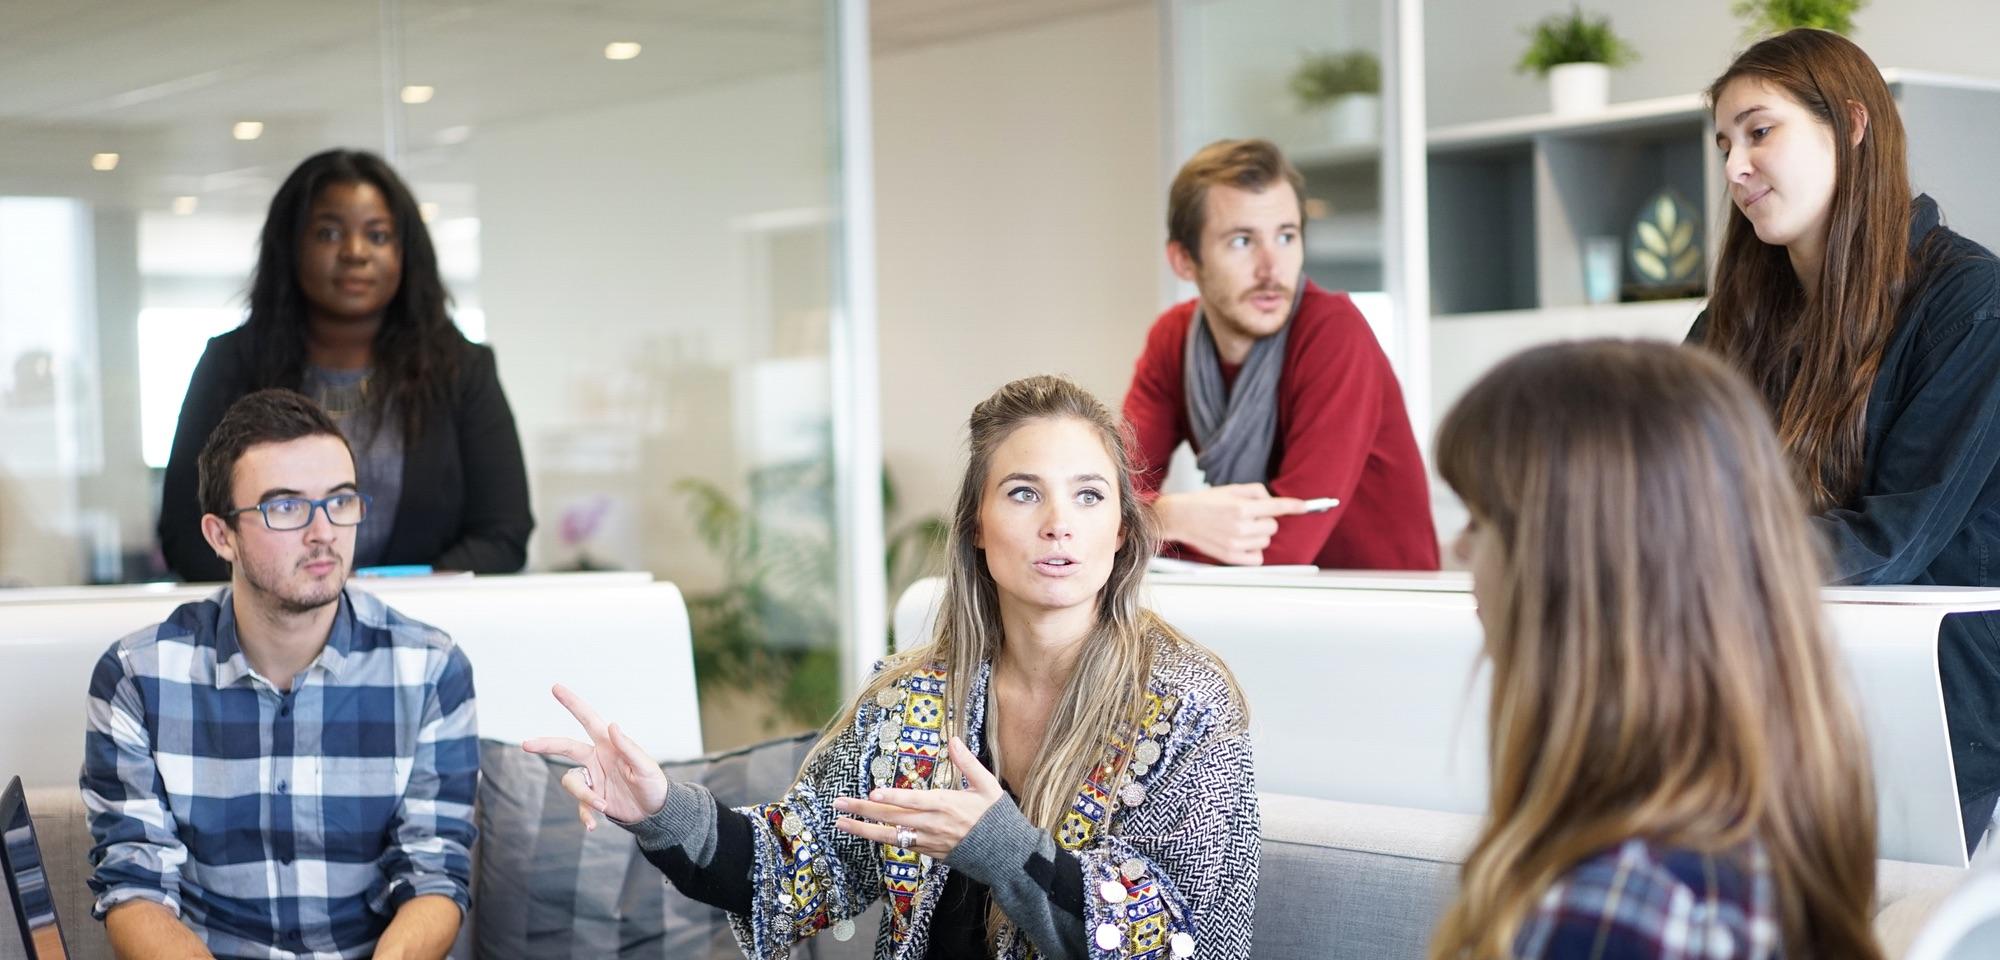 Employer-based health insurance